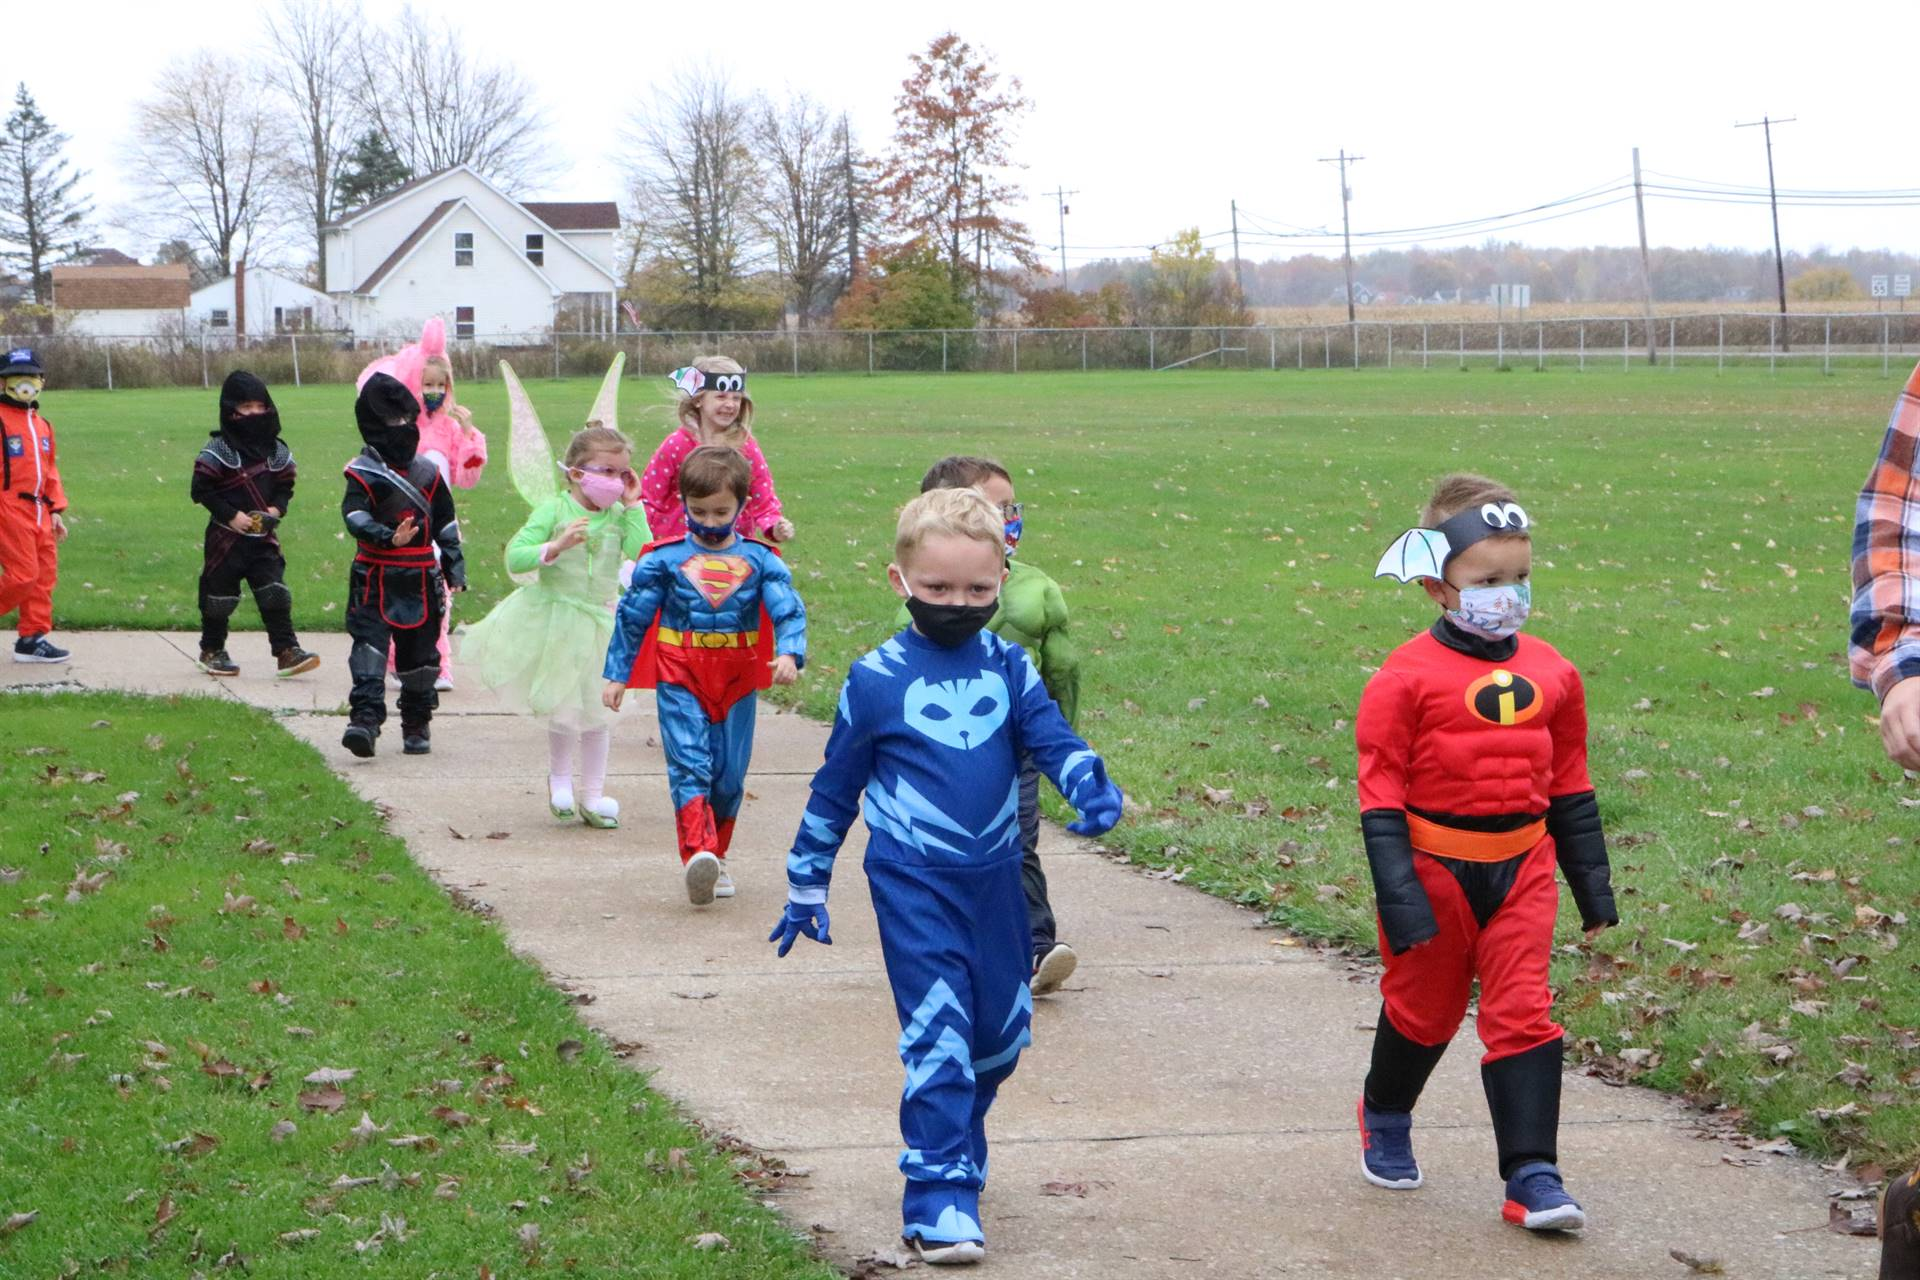 kids walking on sidewalk dressed up